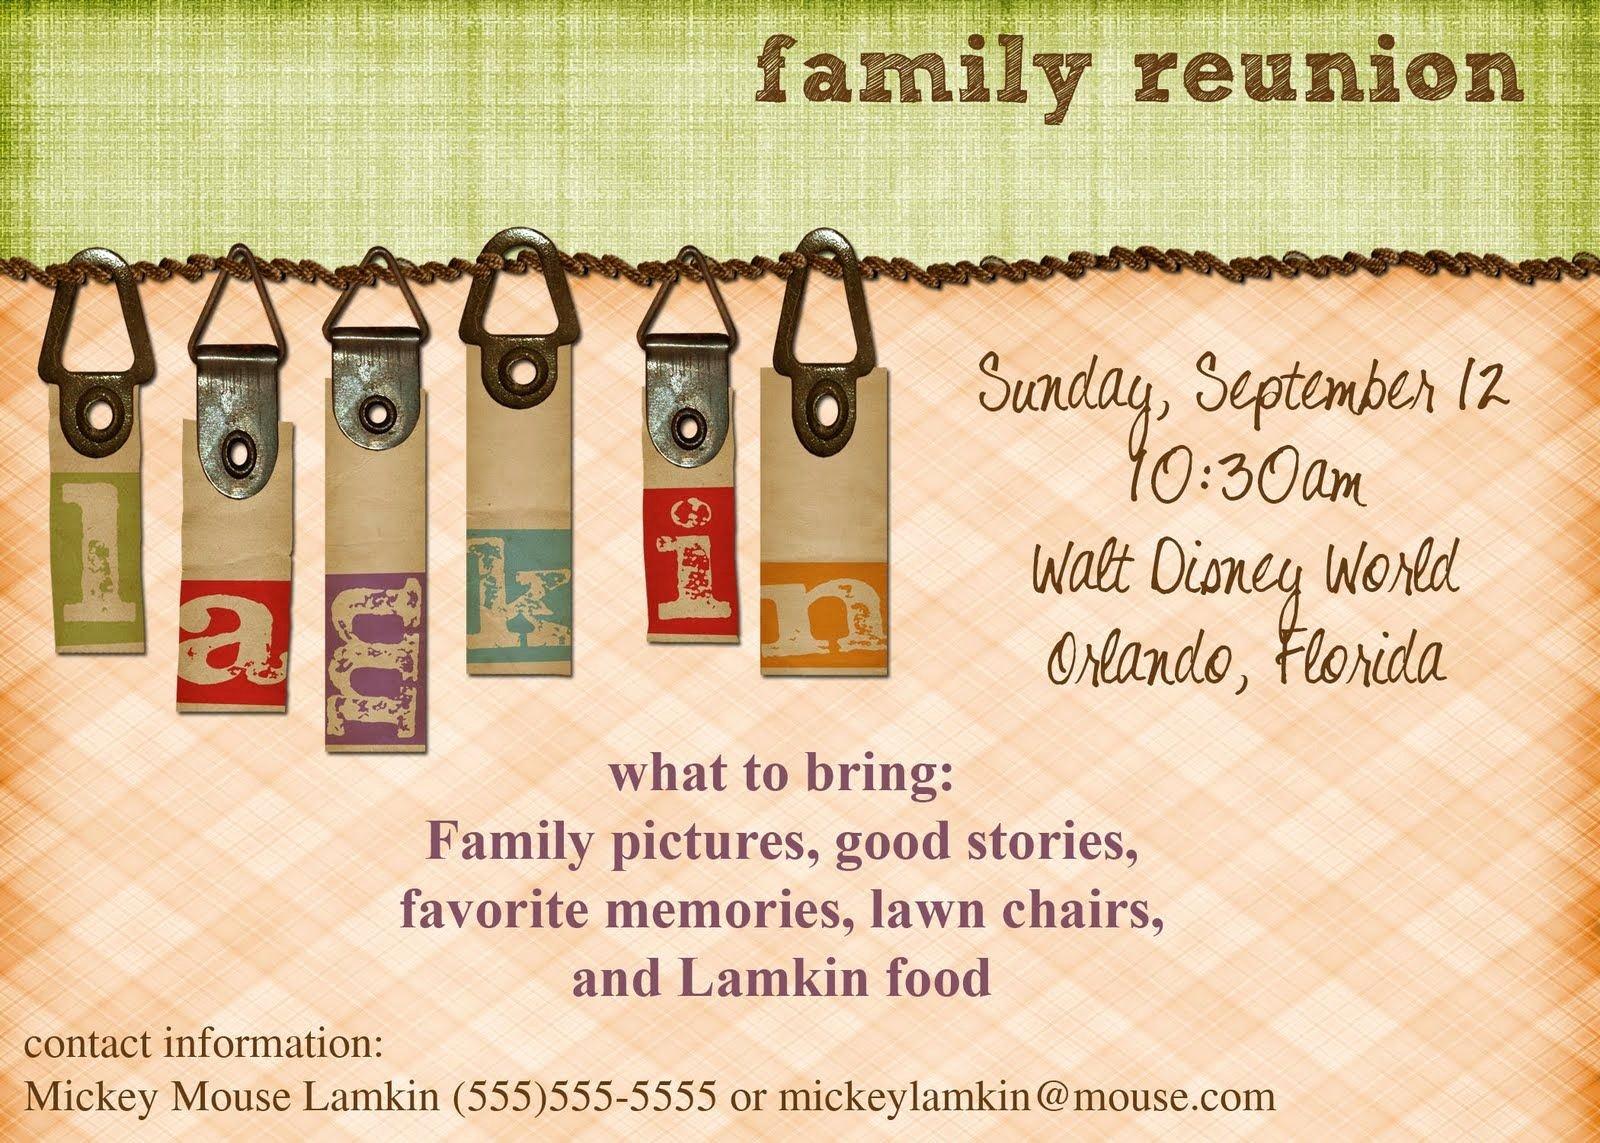 Family Reunion Invitation Templates Free Luxury Viewing Gallery for Family Reunion Invitations